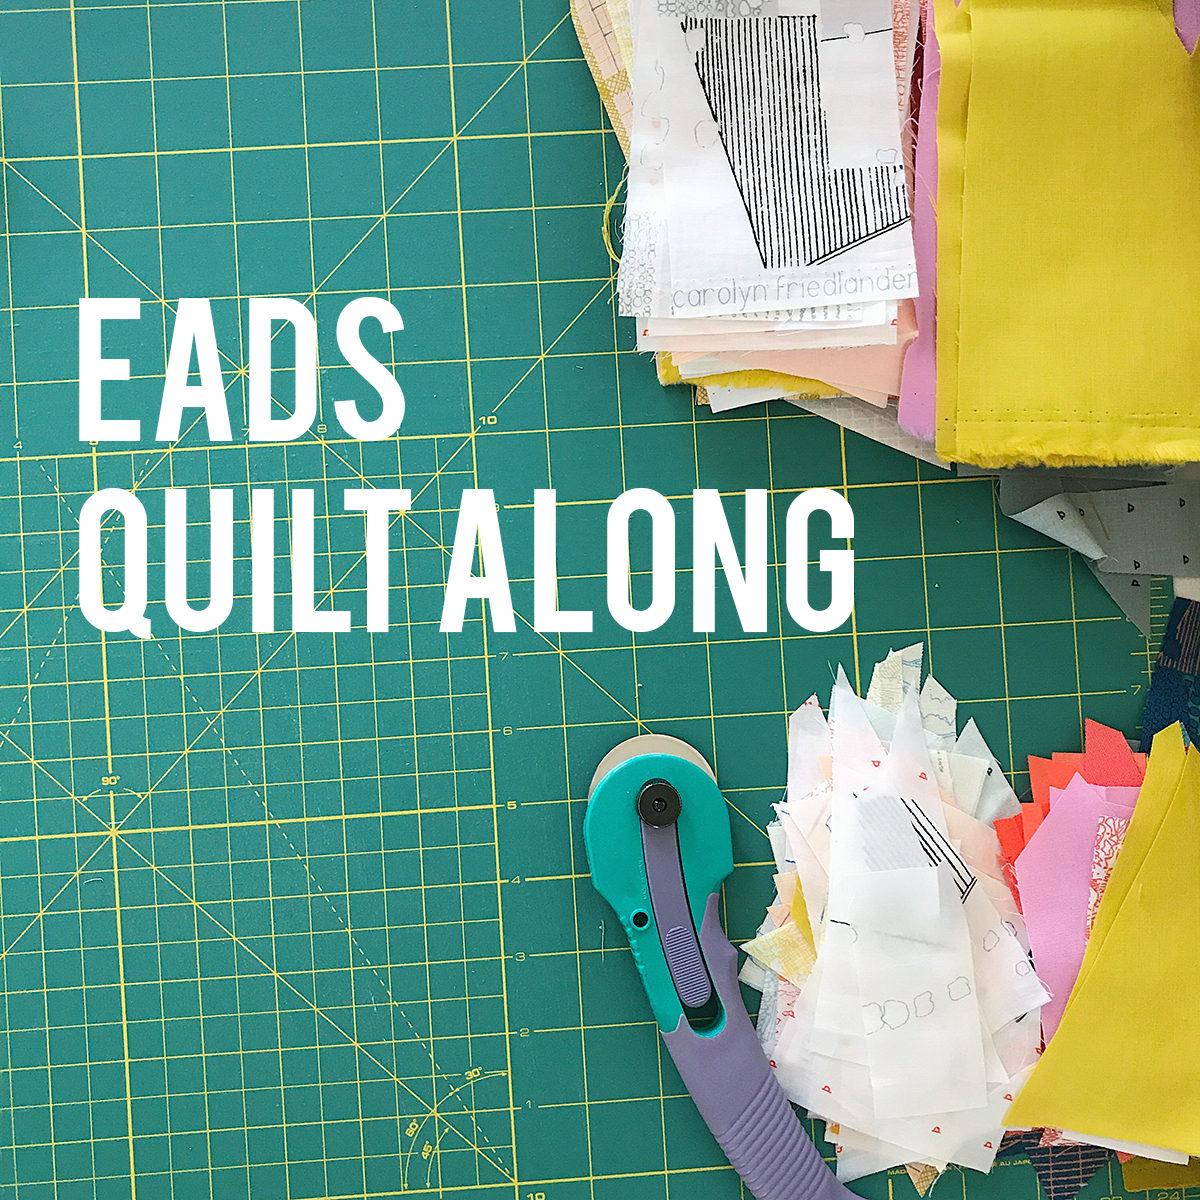 Eads quilt along . Carolyn Friedlander